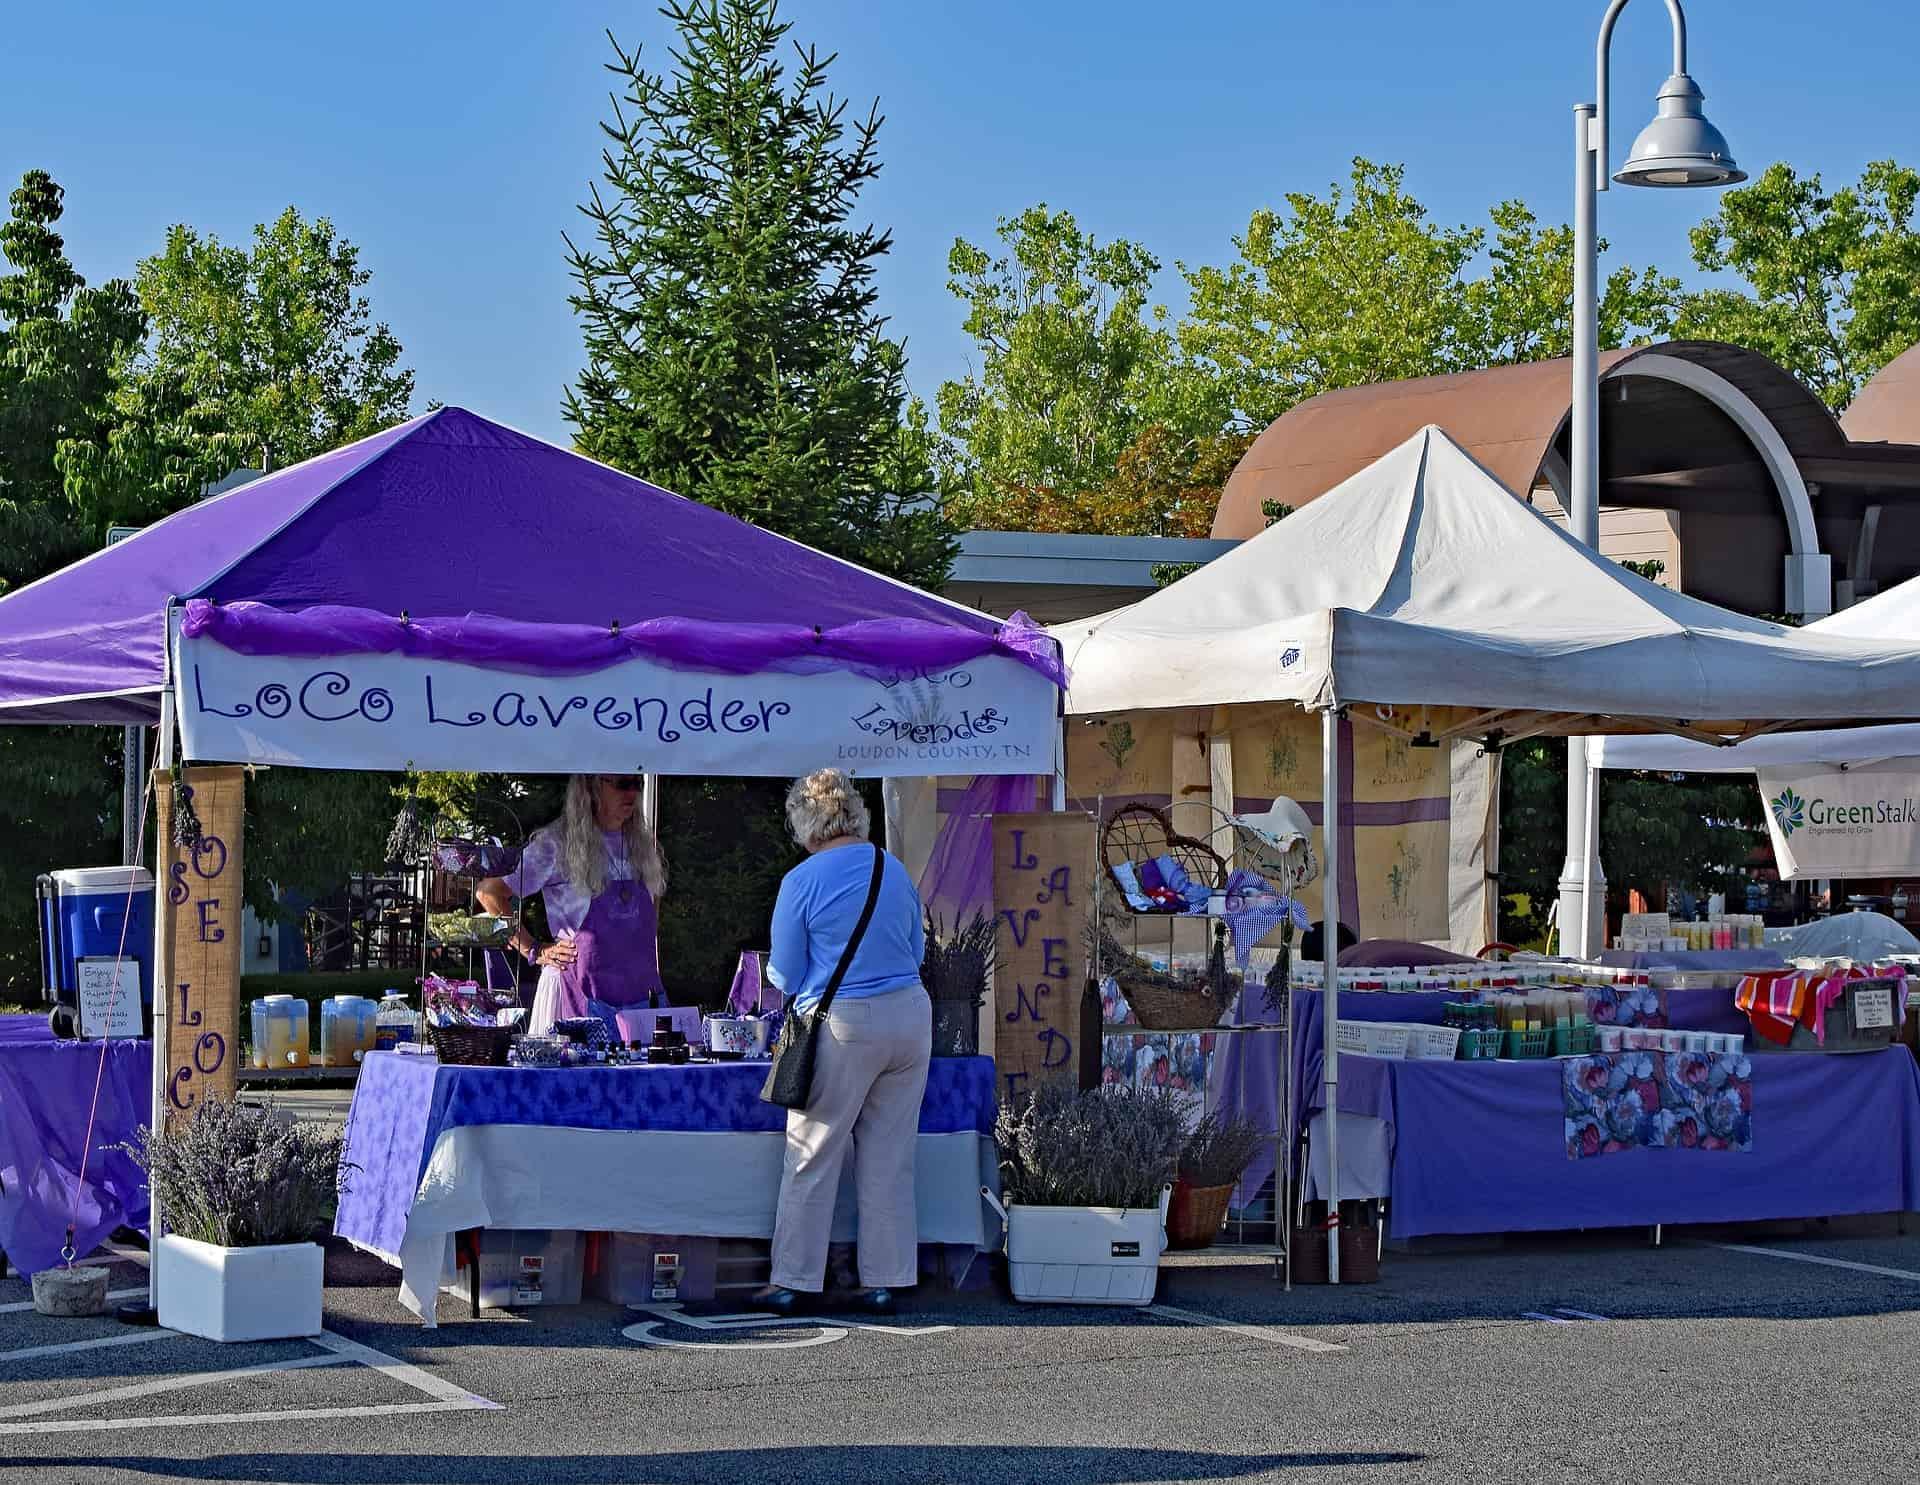 Lavender market, Valensole Plateau in Provence, lavender fields France, Valensole France, lavender fields france season